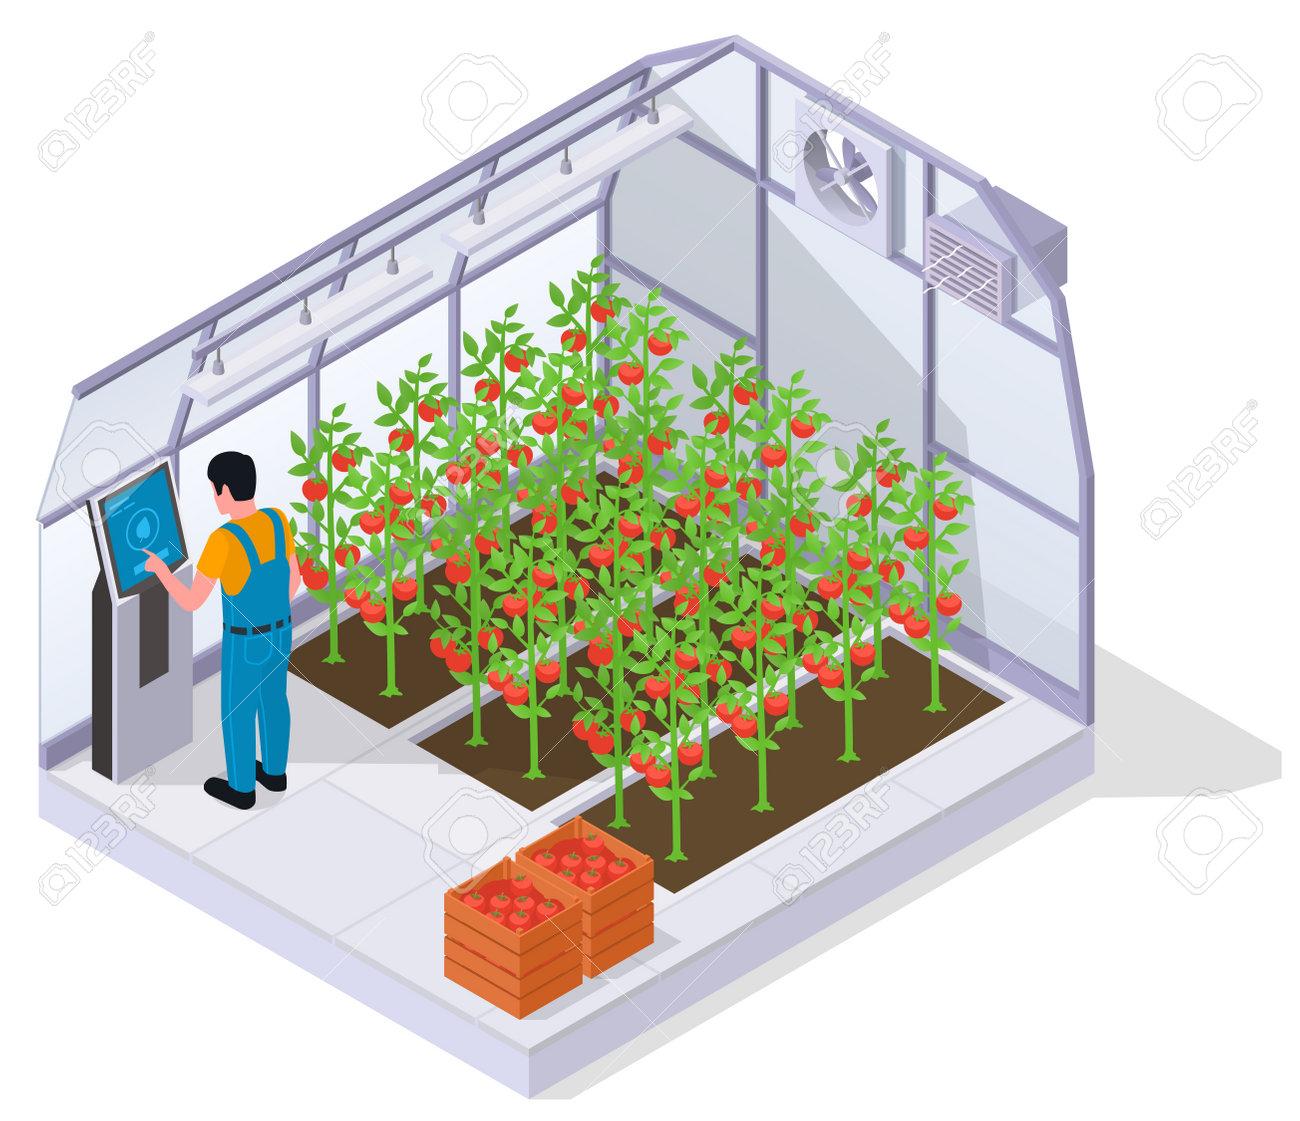 Modern Greenhouse Isometric Concept - 171636183